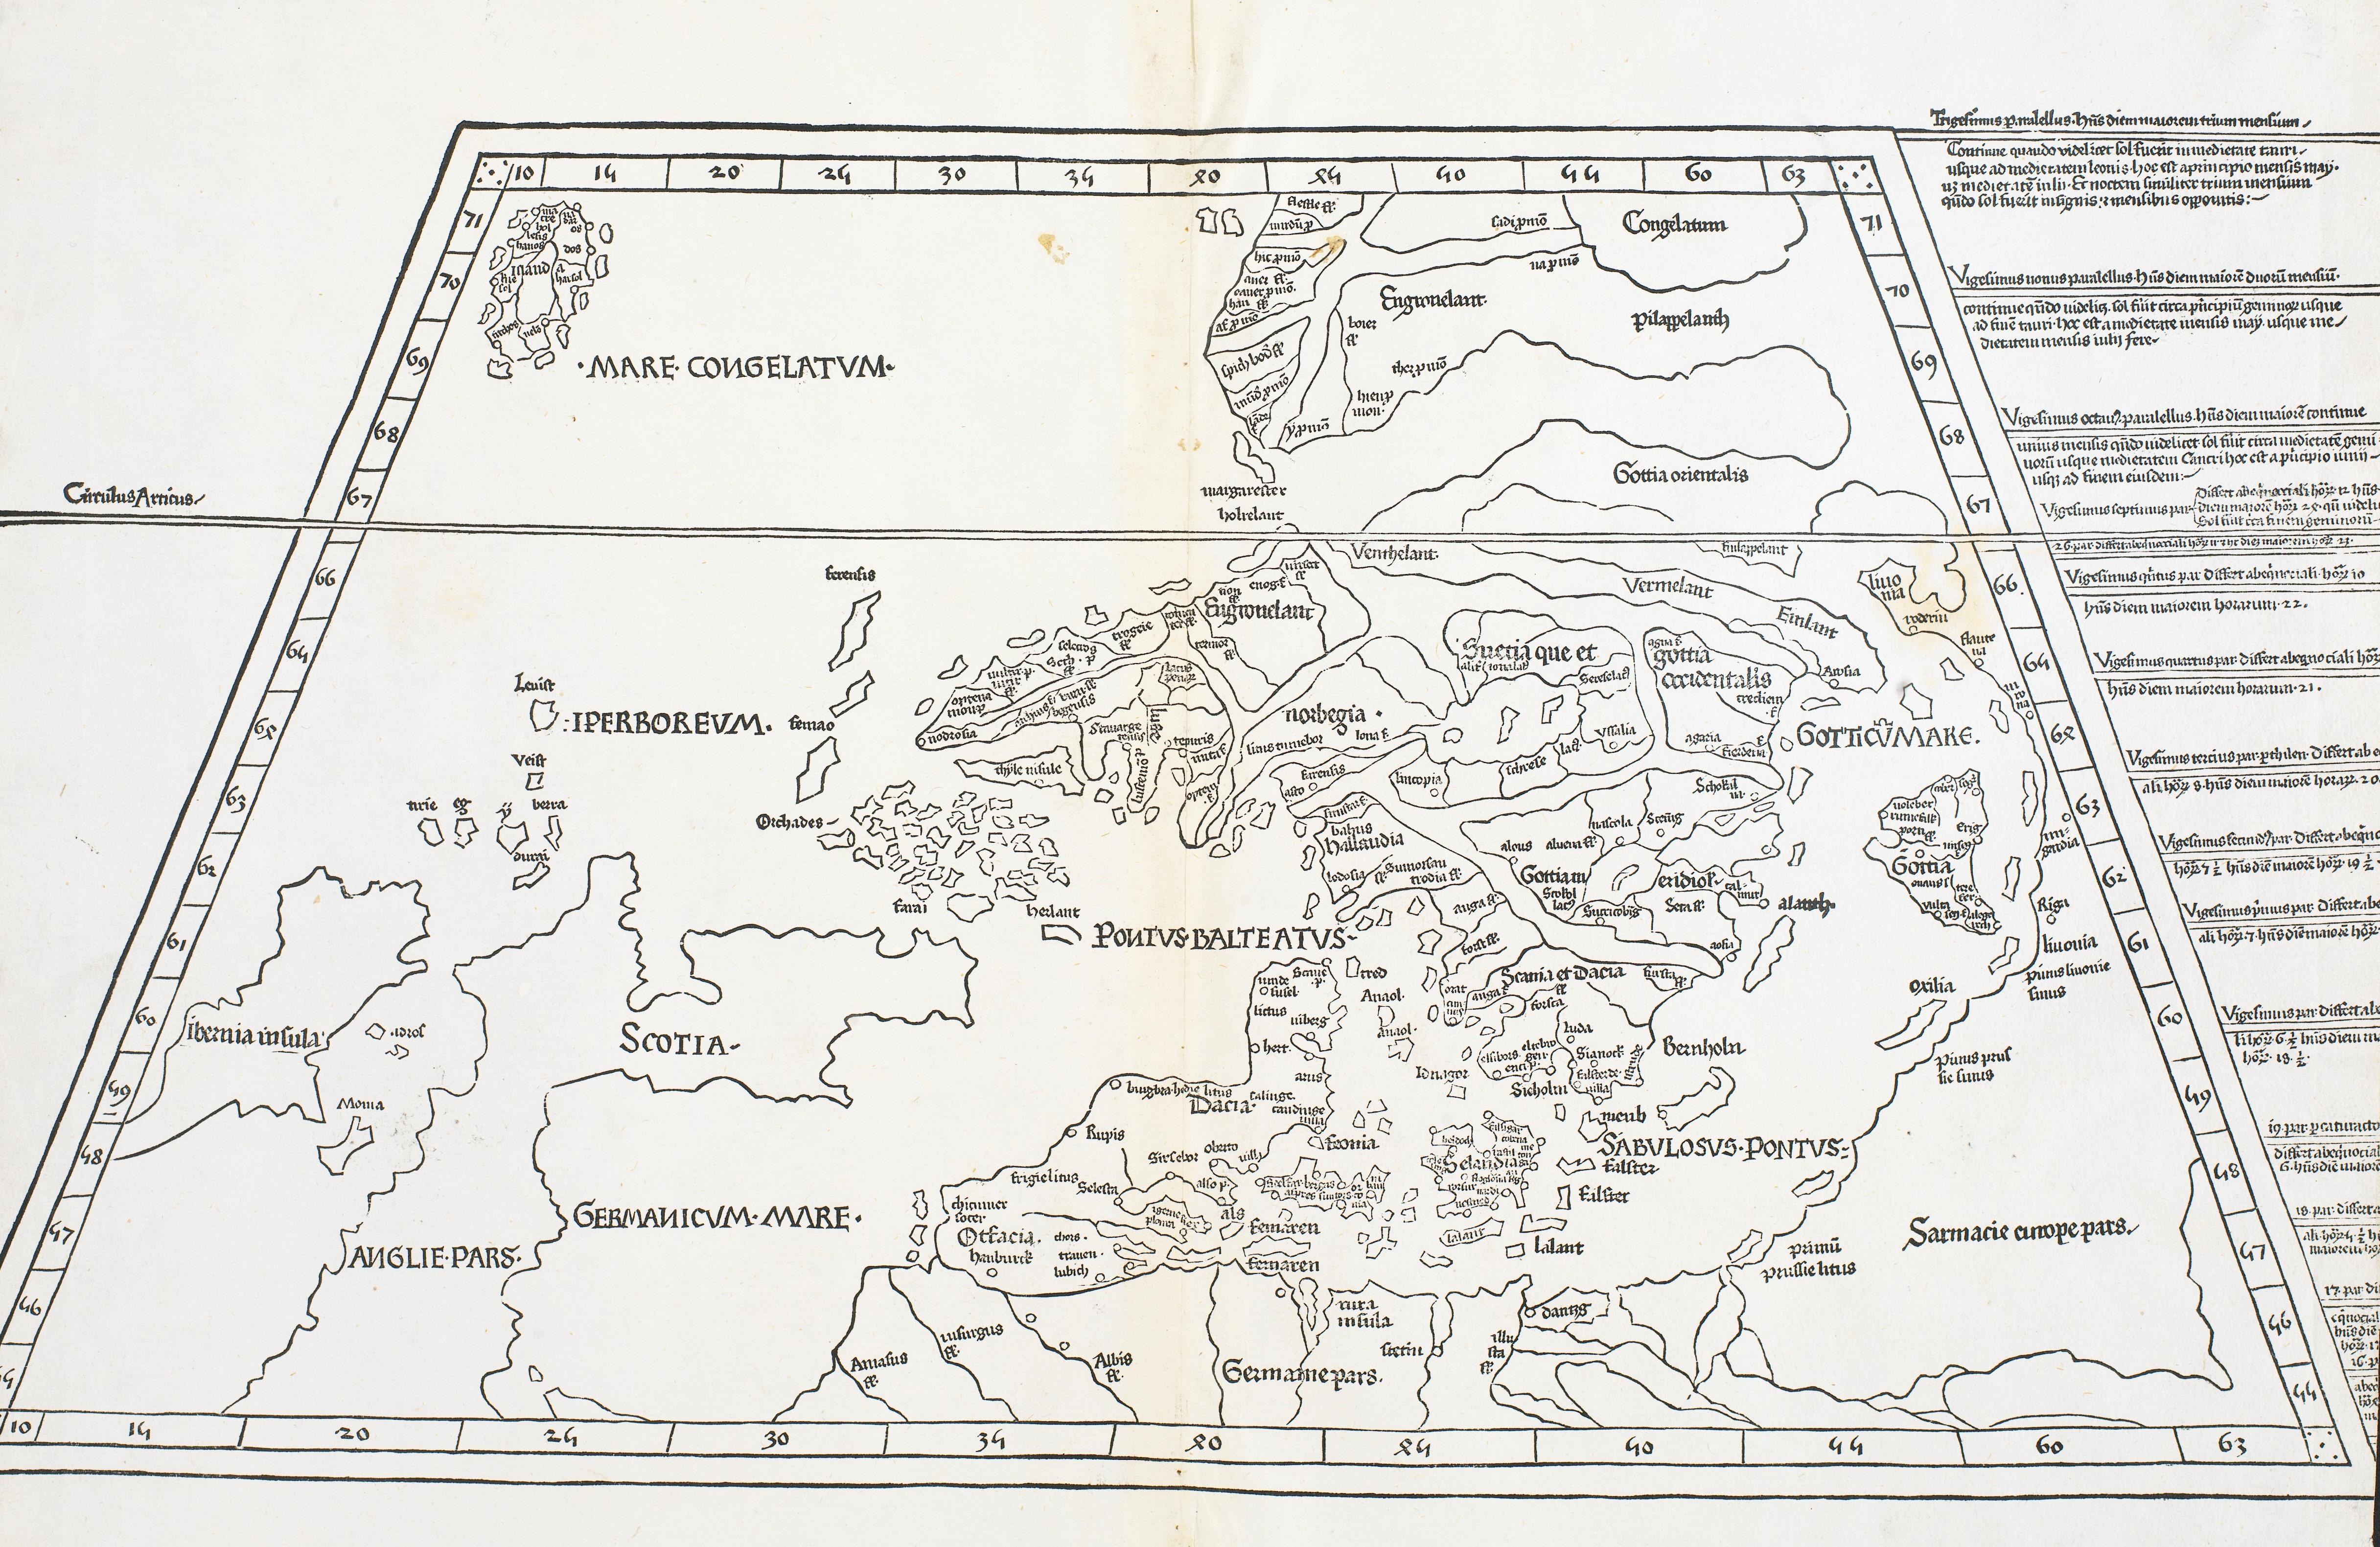 kart norden no File:Nordenkart   no nb krt 00481.   Wikimedia Commons kart norden no